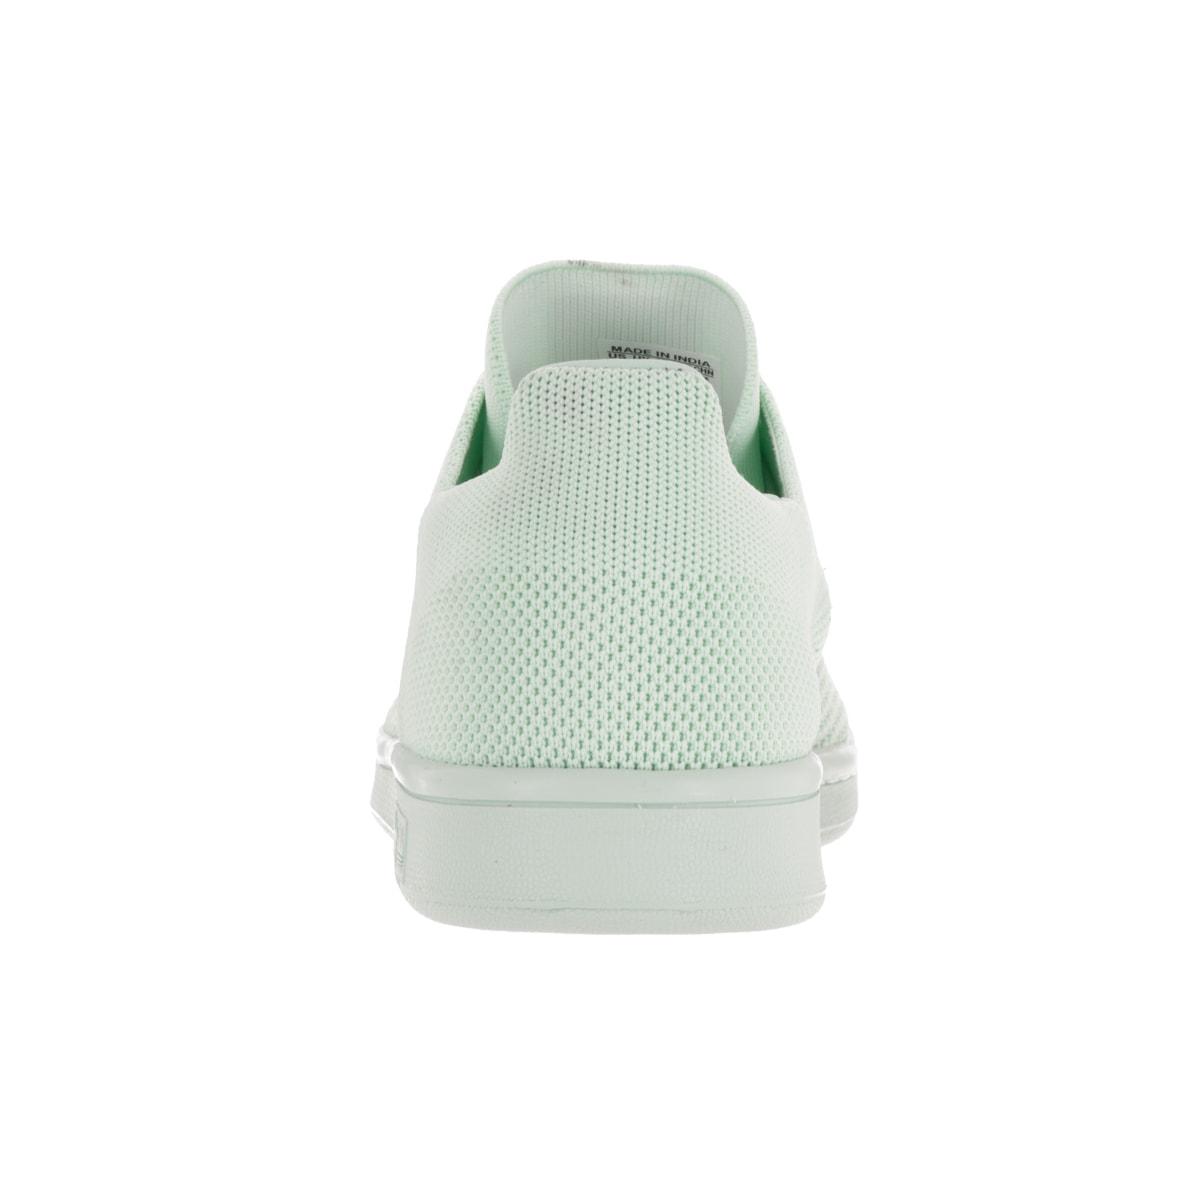 63f9dfe8bb Adidas Men's Stan Smith Pk Vapgrn/Vapgrn/Vapgrn Casual Shoe